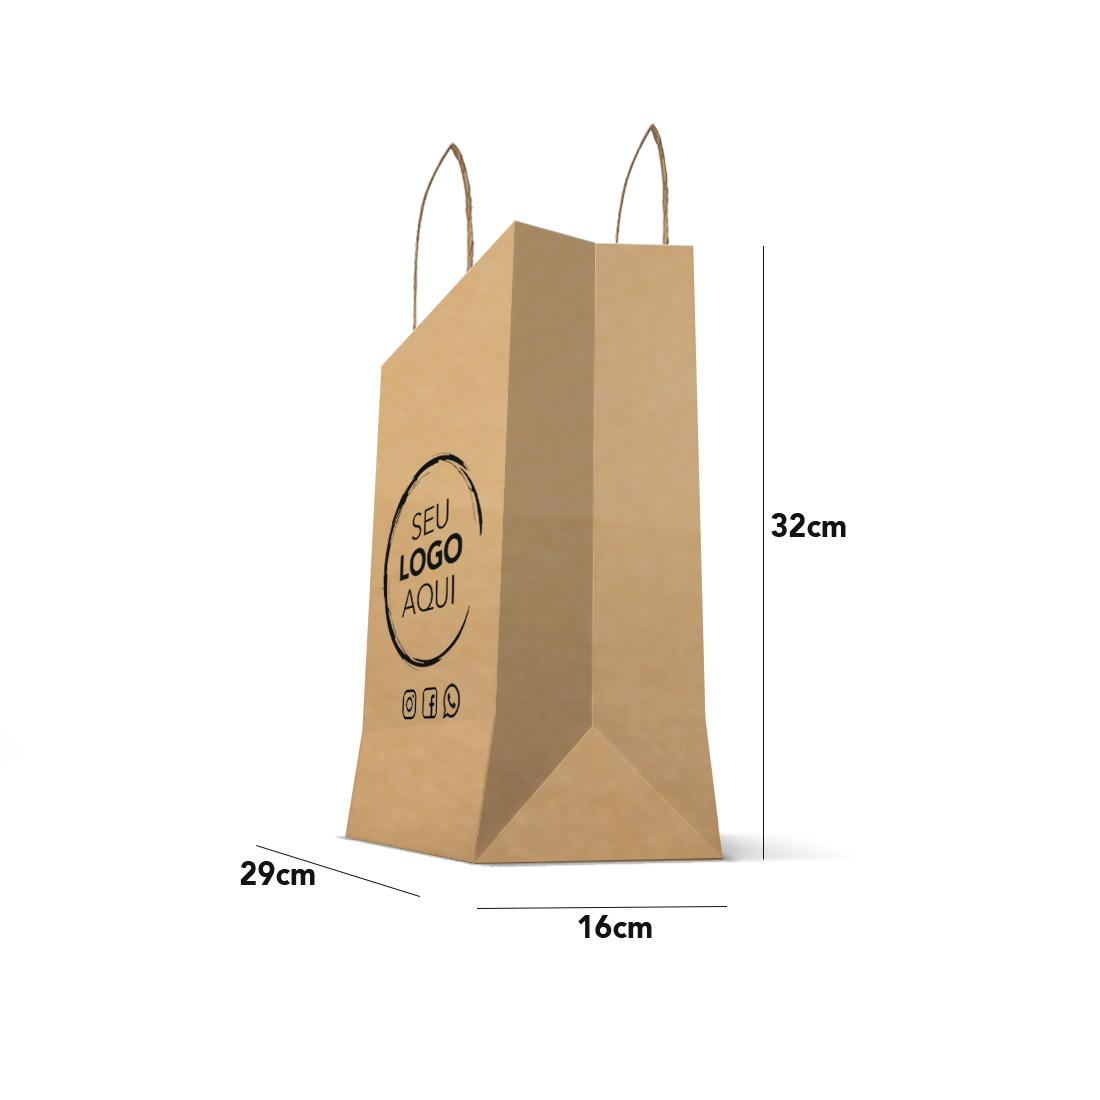 Sacola Kraft Personalizada Tamanho Delivery (29 x 32 x 16)